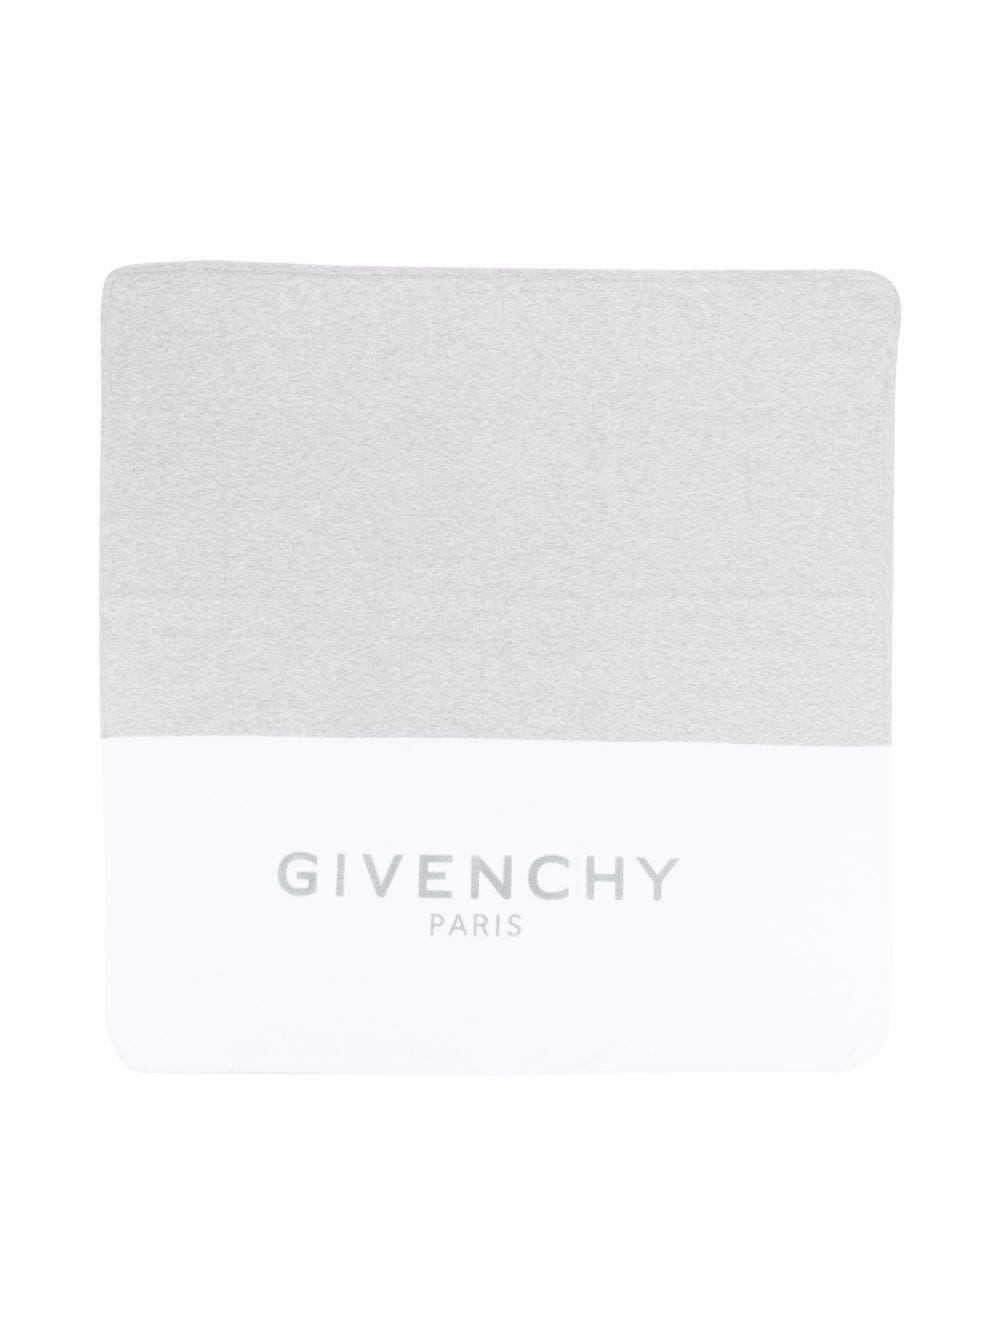 H90092 / N00 WHITE GREY / Blanket With Large Logo